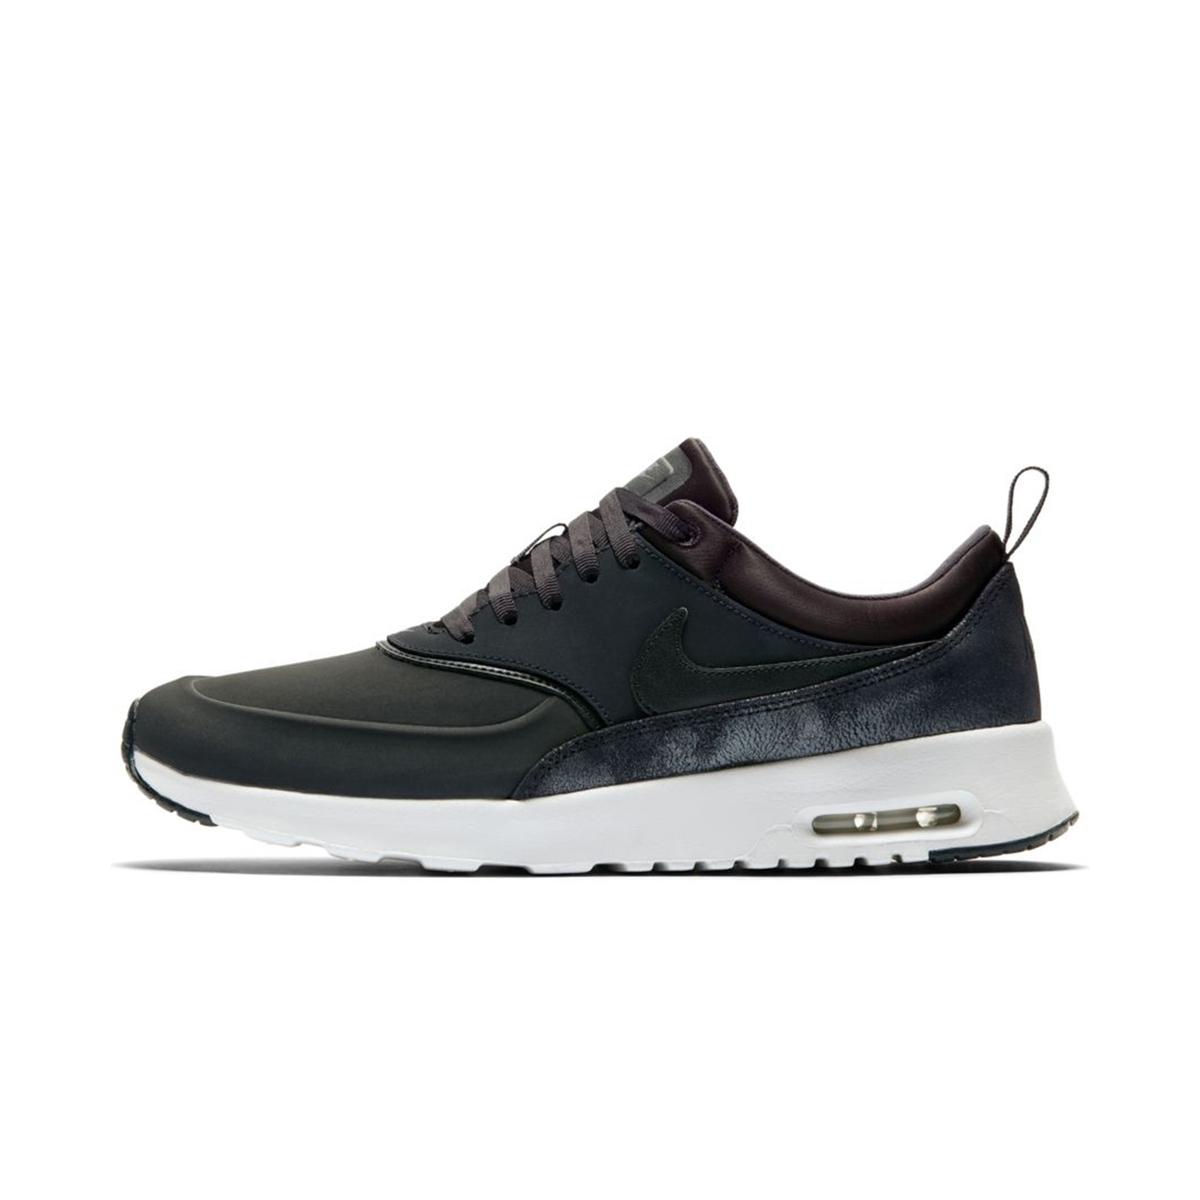 Imagen secundaria de producto de Zapatillas Air Max Thea - Nike